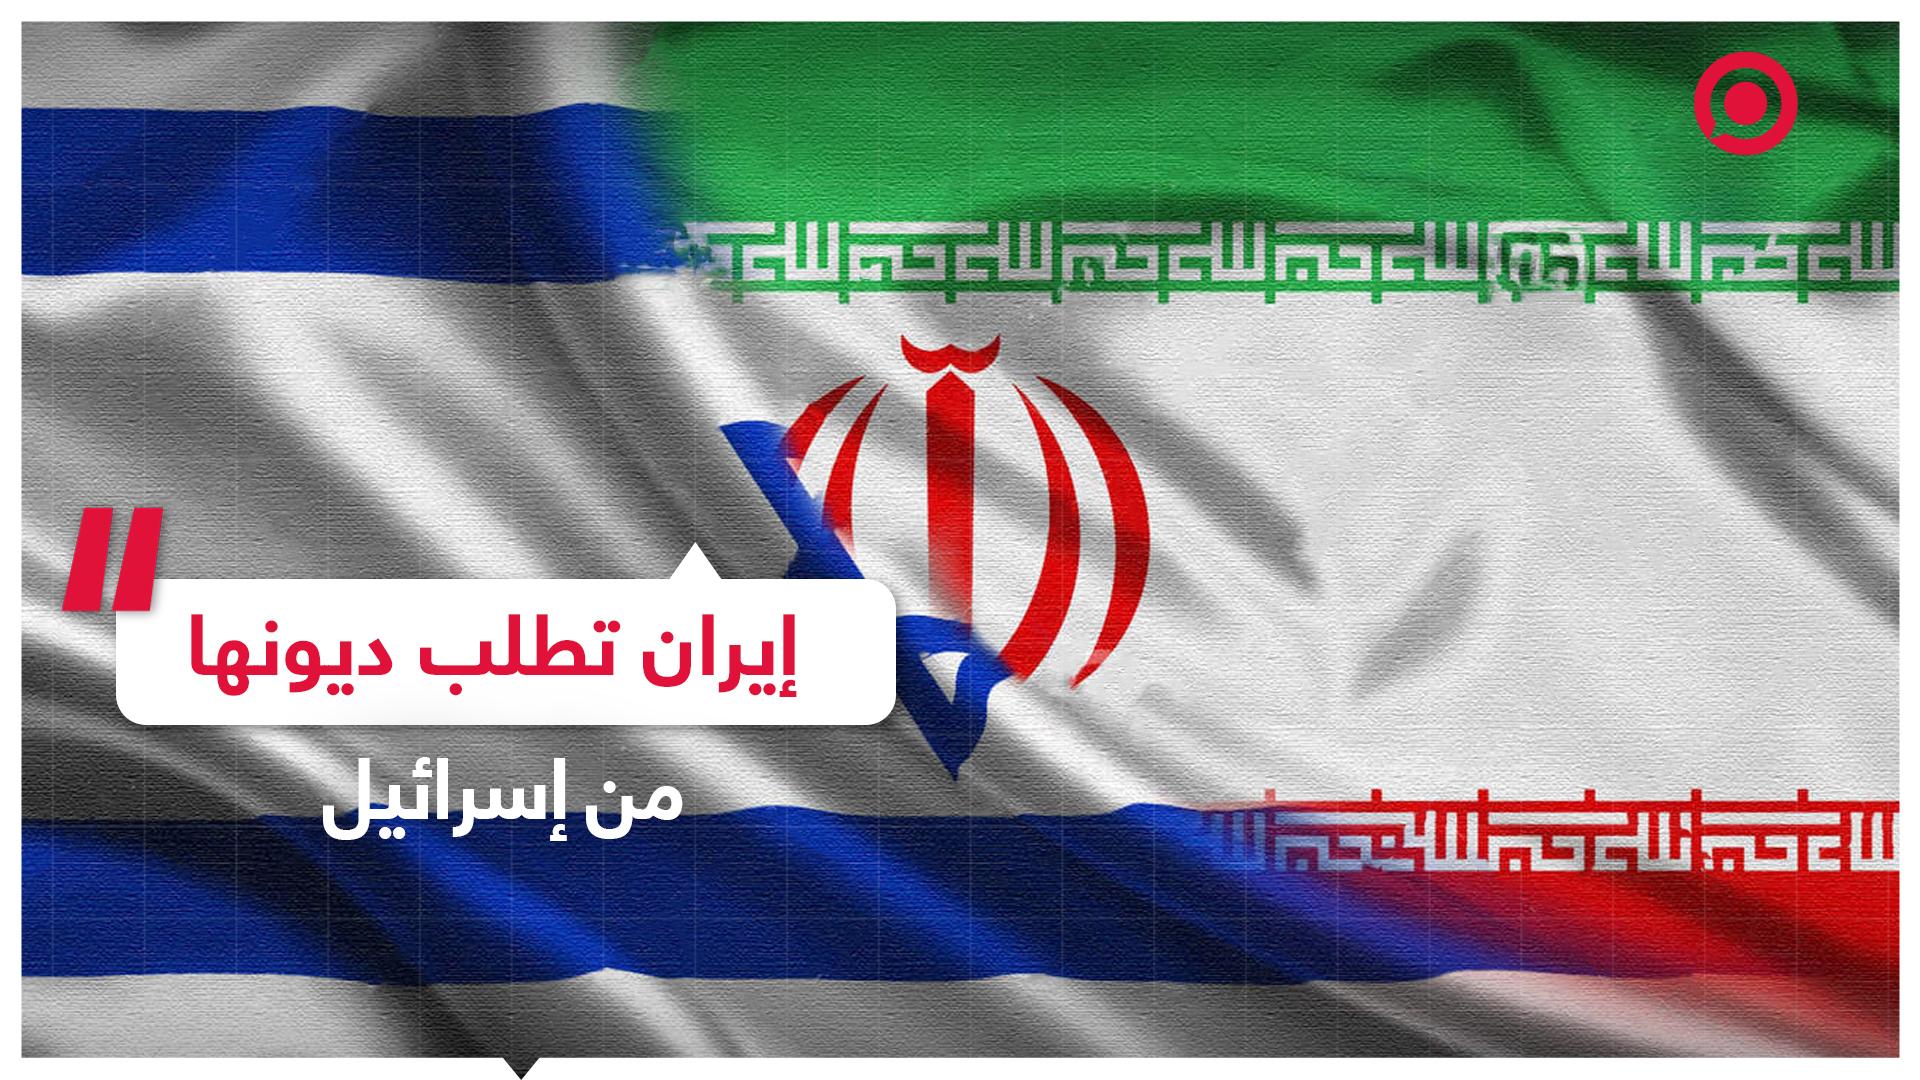 إيران تطلب ديونها من إسرائيل!